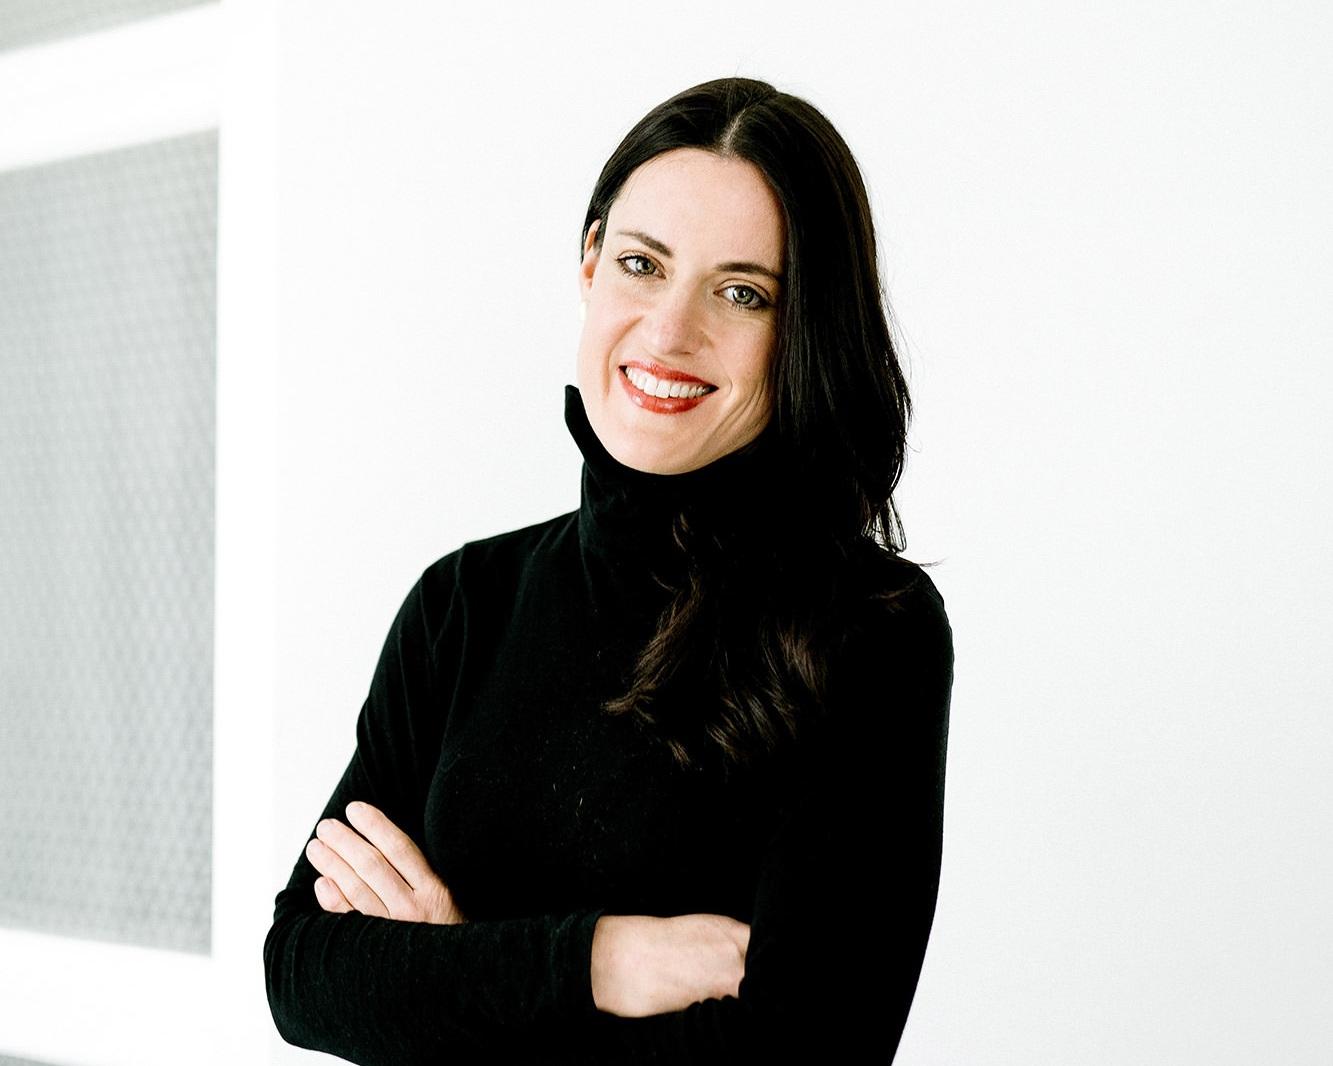 Lisa Smyth